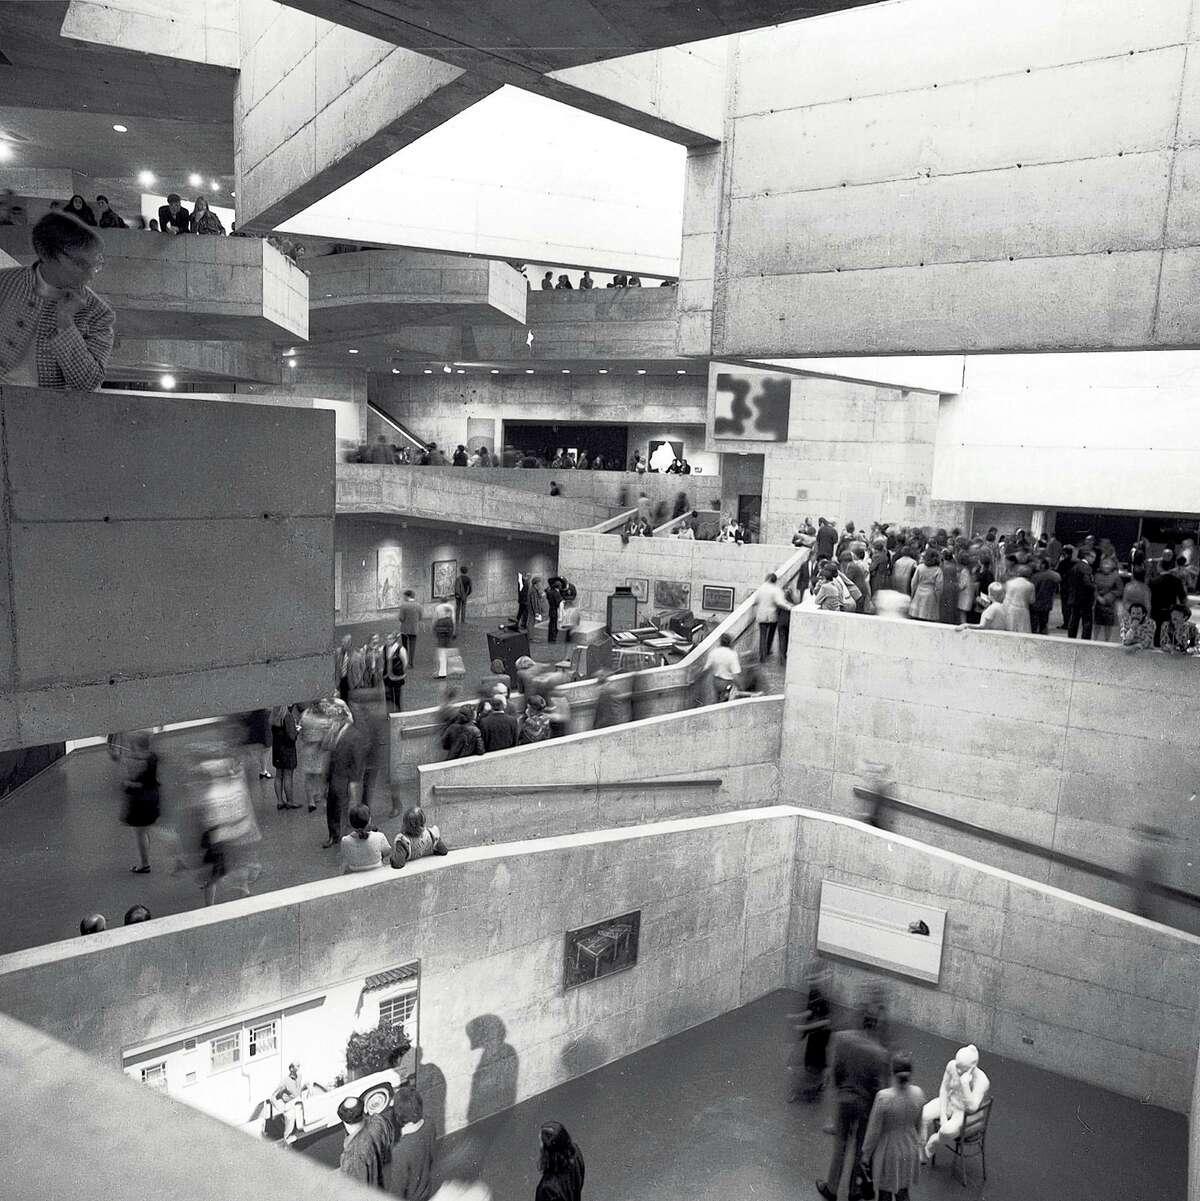 the opening University of California Art Museum, which opened November 1970 Photo taken November 5, 1970